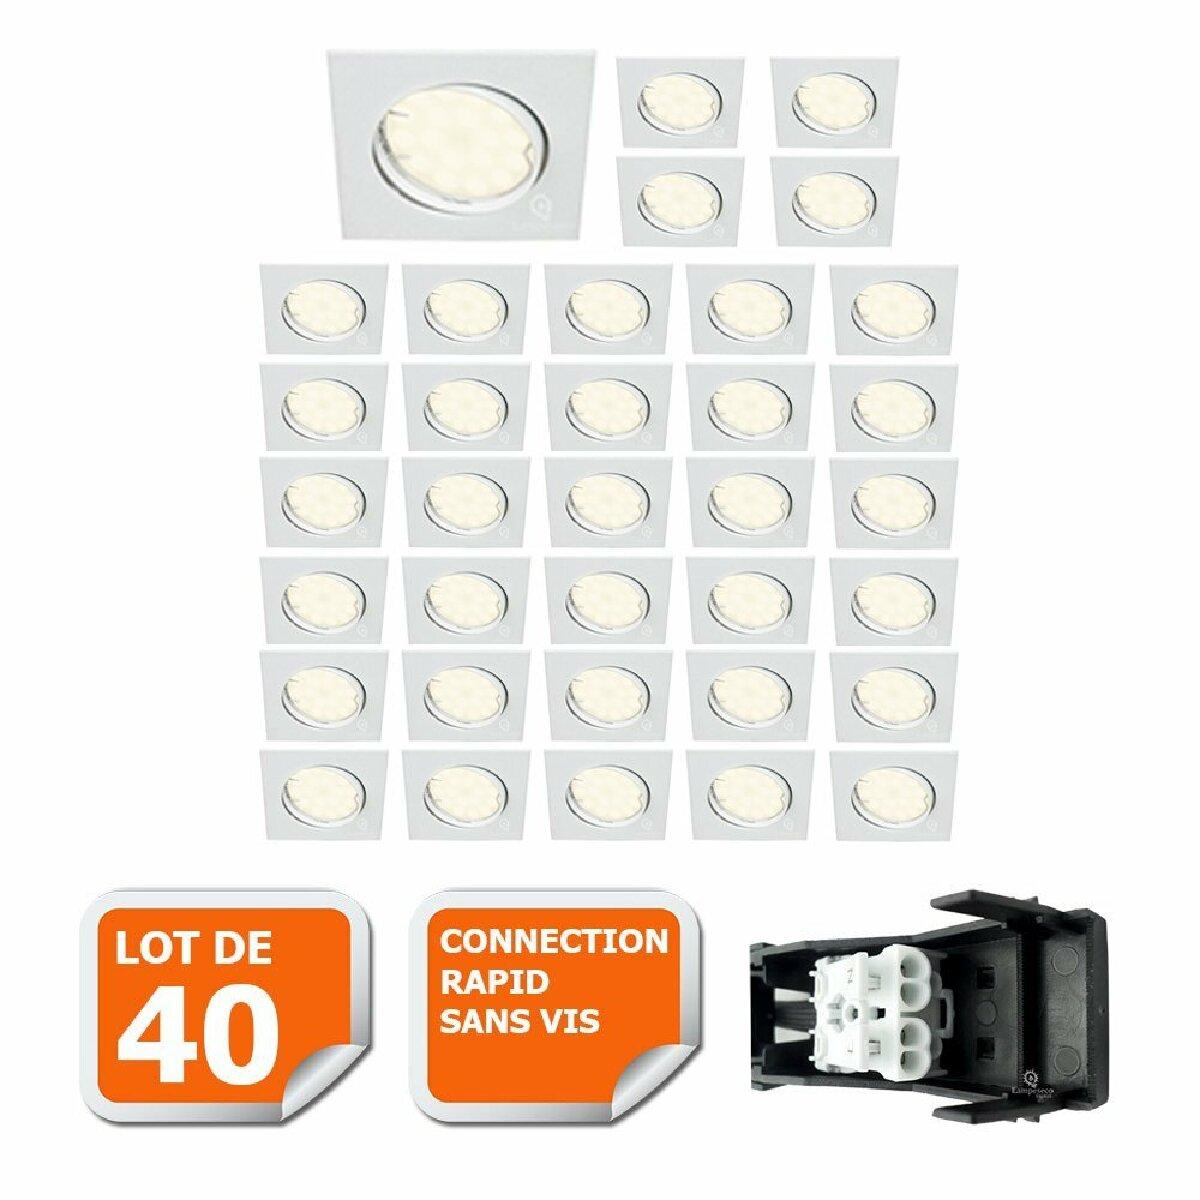 Lampesecoenergie LOT DE 40 SPOT ENCASTRABLE ORIENTABLE CARRE LED SMD GU10 230V BLANC RENDU ENVIRON 50W HALOGENE